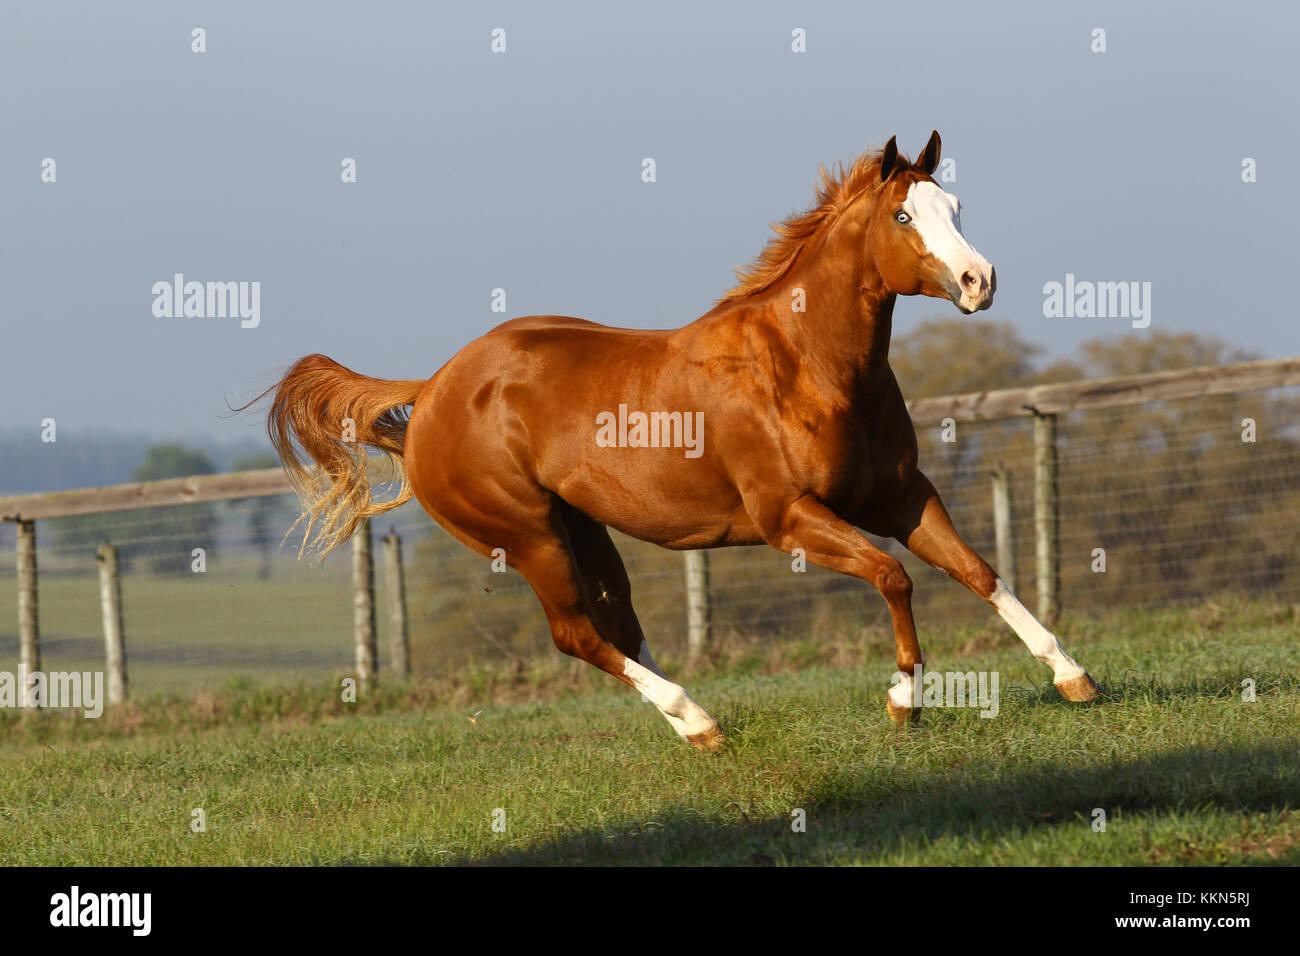 overo paint horse mare stock photo 167037350 alamy